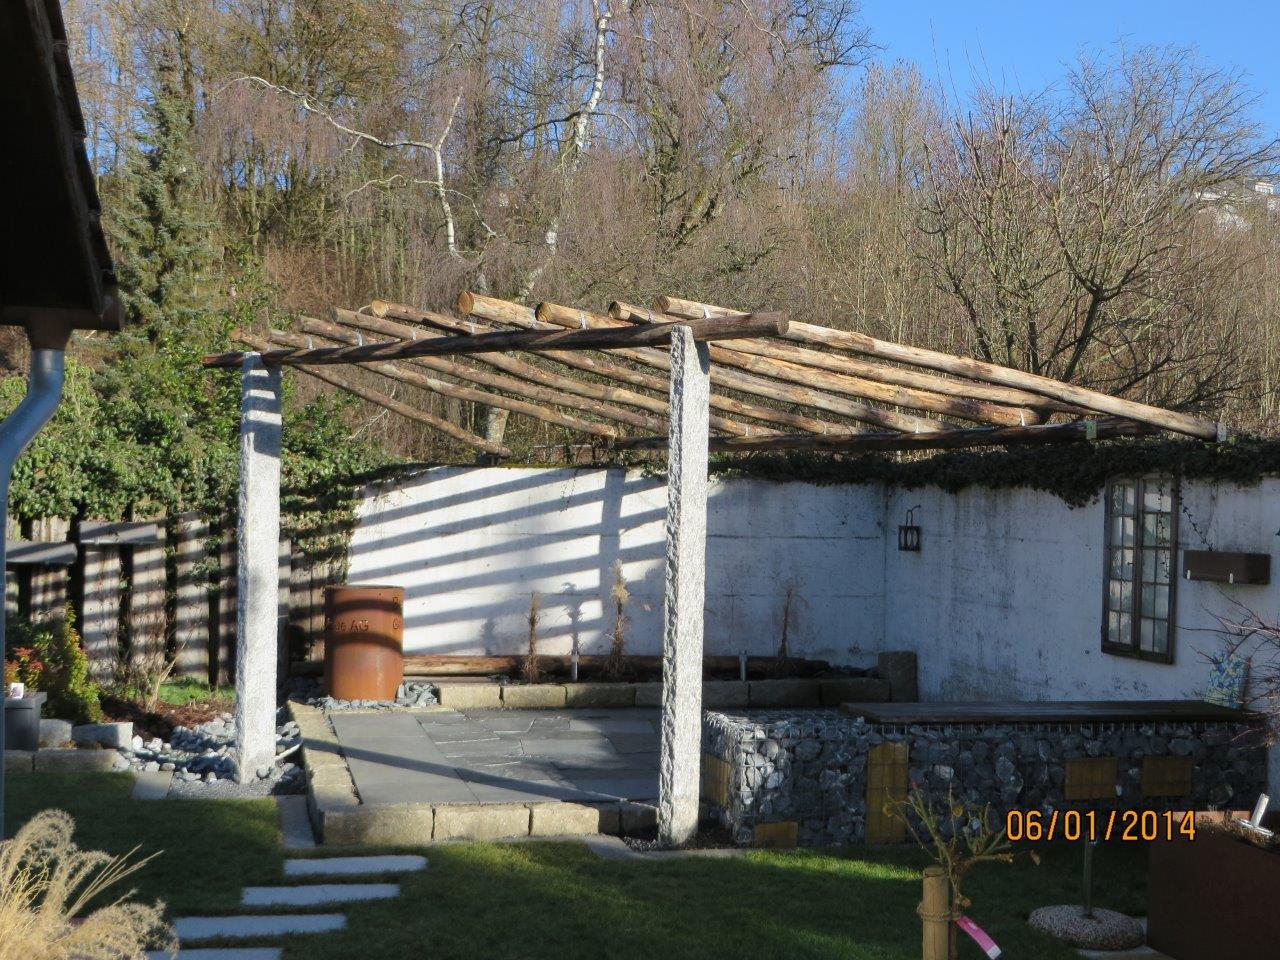 Lehrlingsprüfungsarbeit: Granitplatten formwild, Pergola mit Granitstelen und Kastanienholz